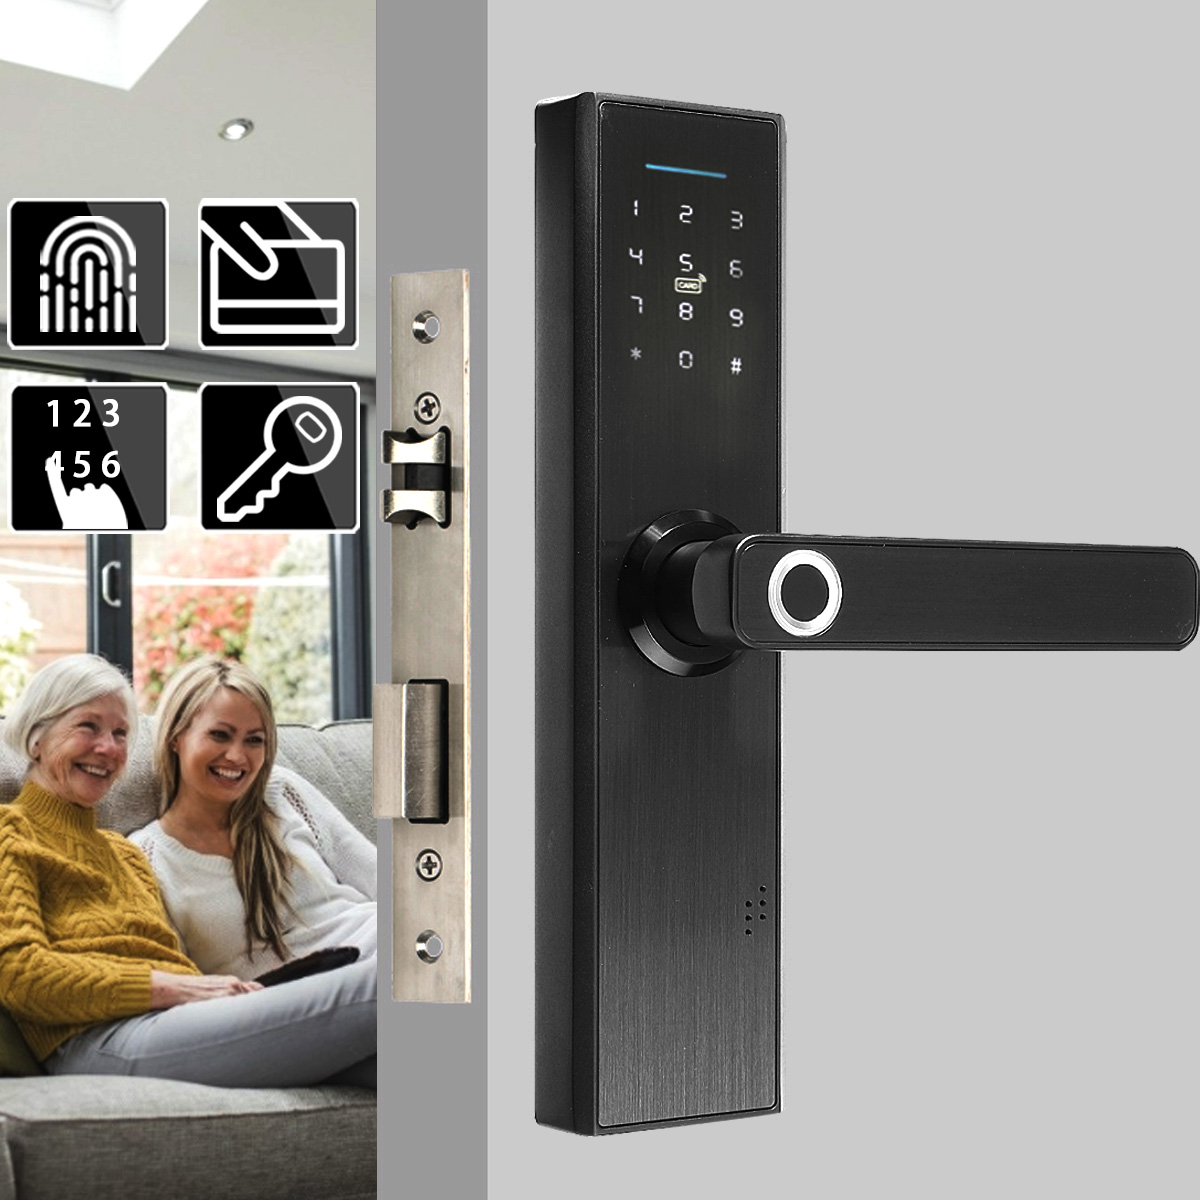 Security Electronic Door Lock Biometric Fingerprint / Digital Code / Smart Card / Key Touchable Screen Smart Lock For Home Hotel